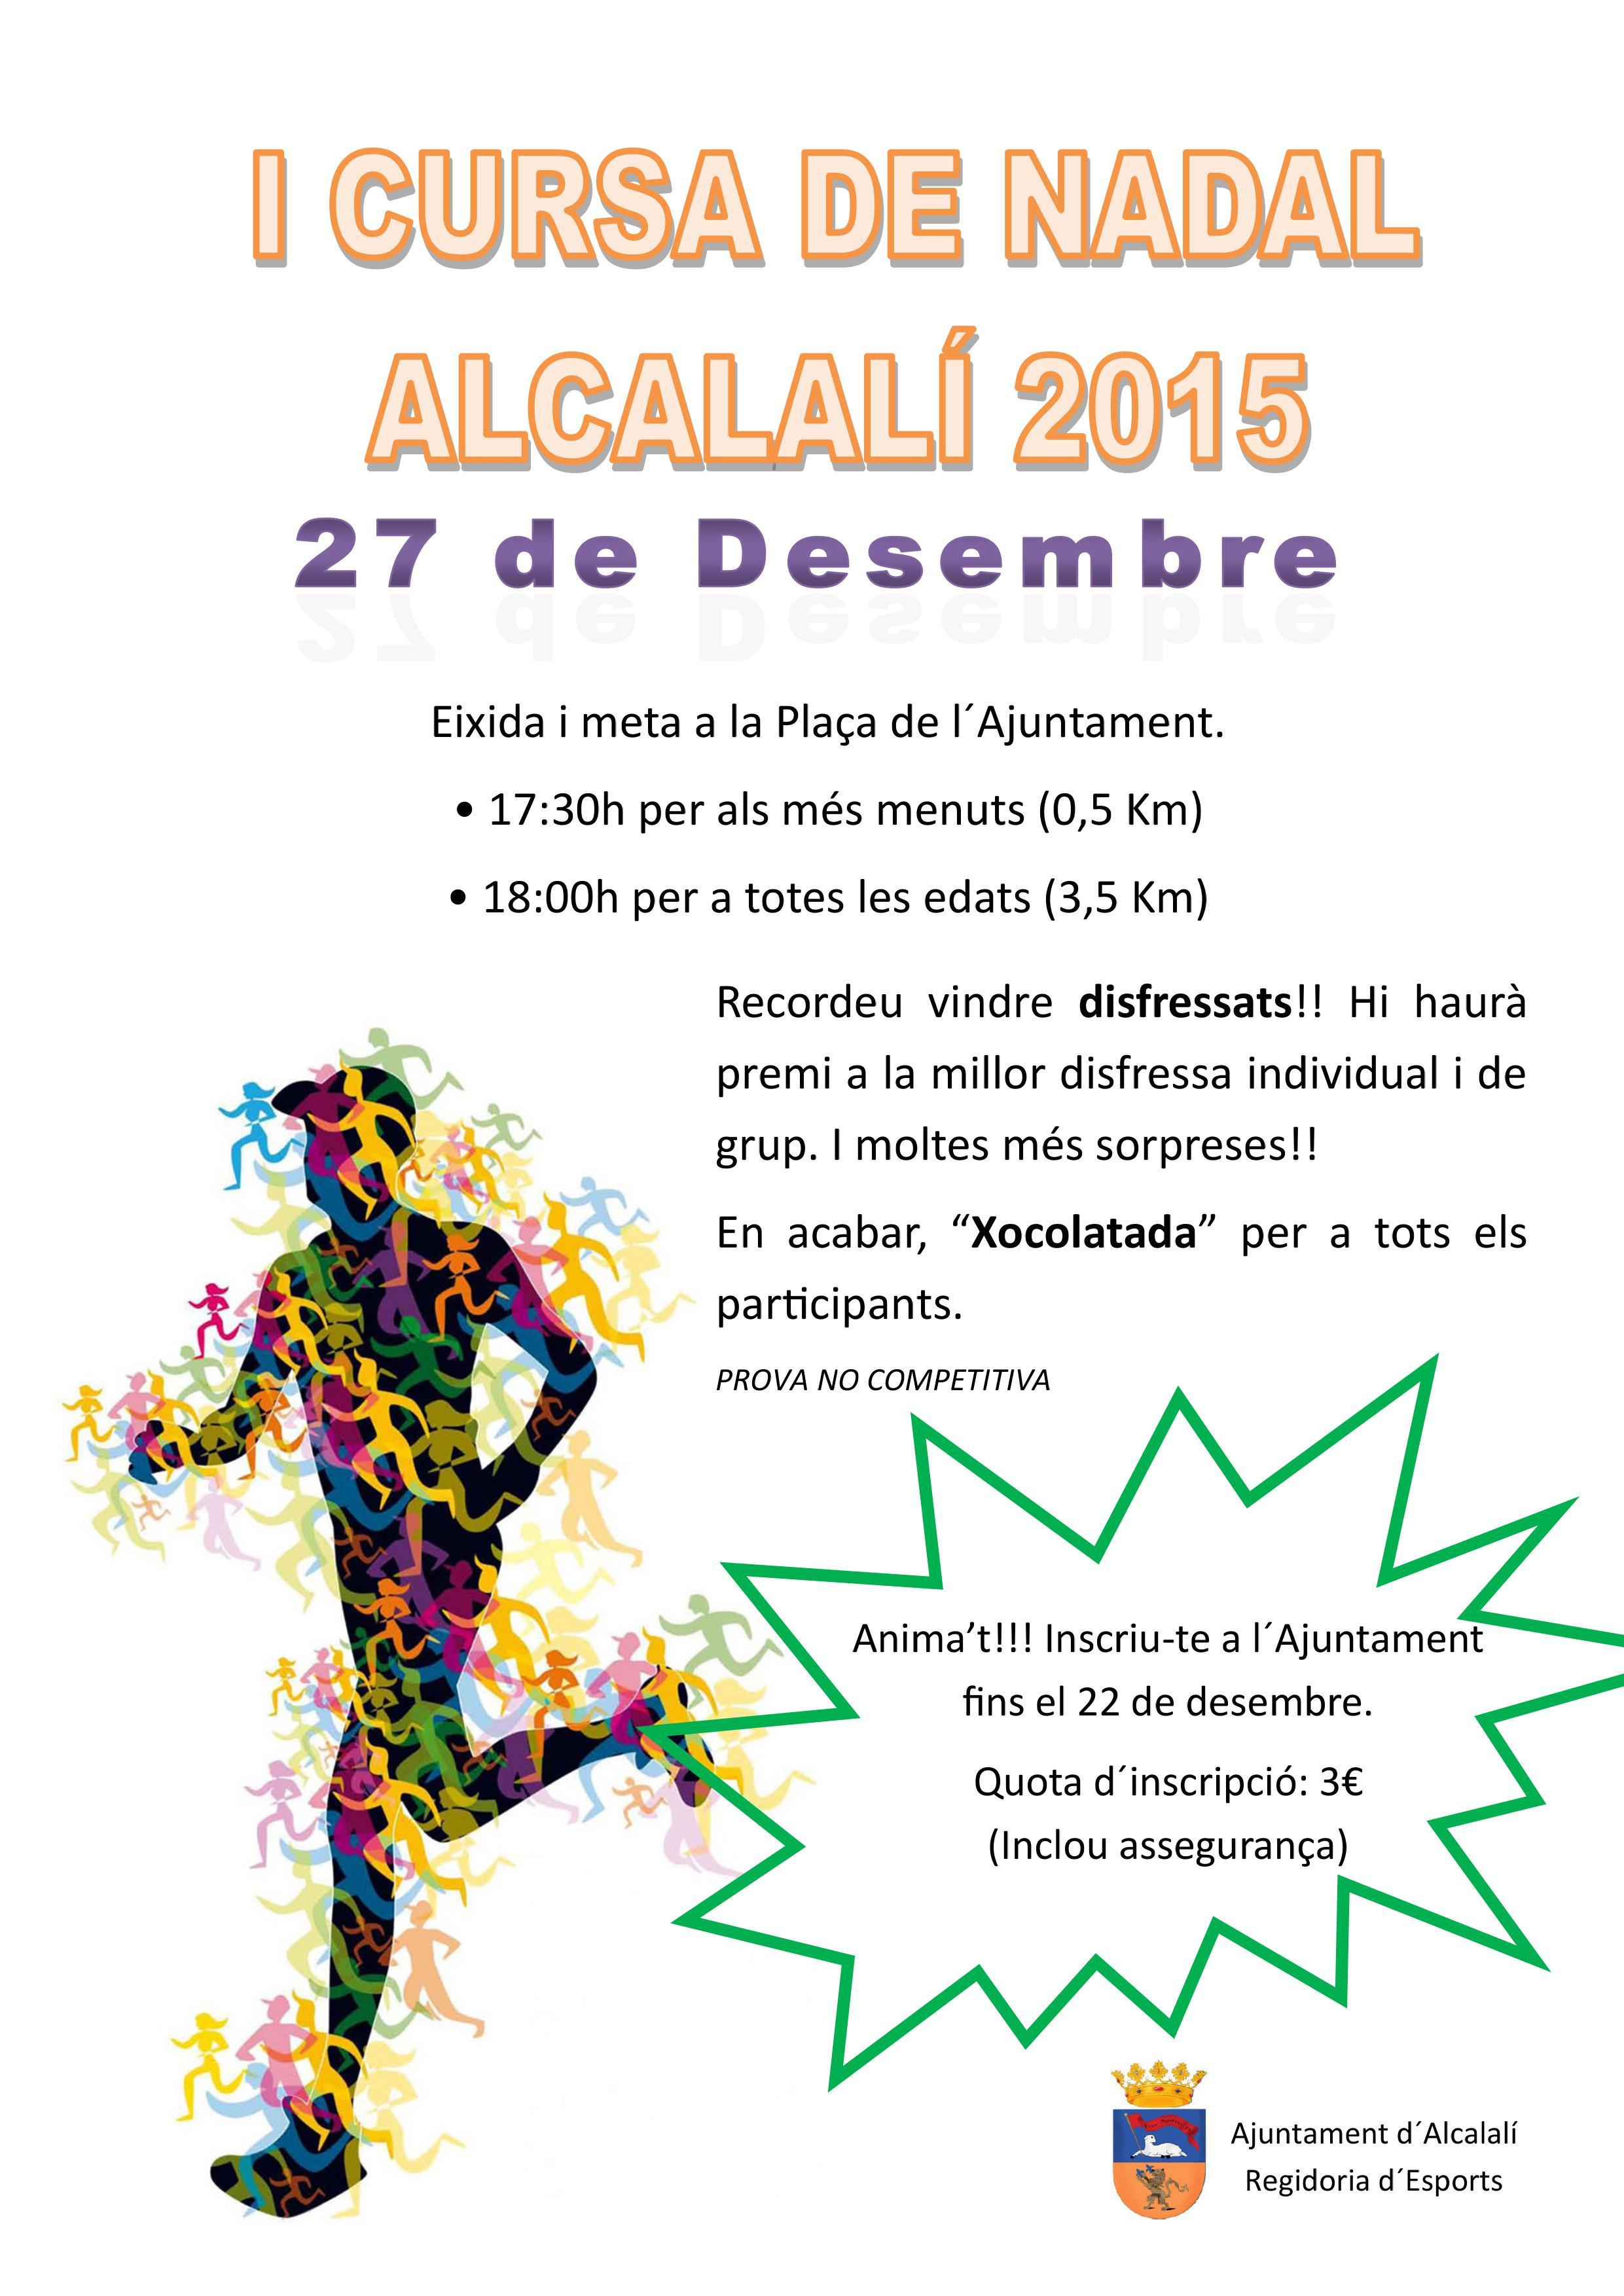 Cartel Cursa de Nadal 2015 - Alcalalí turismo